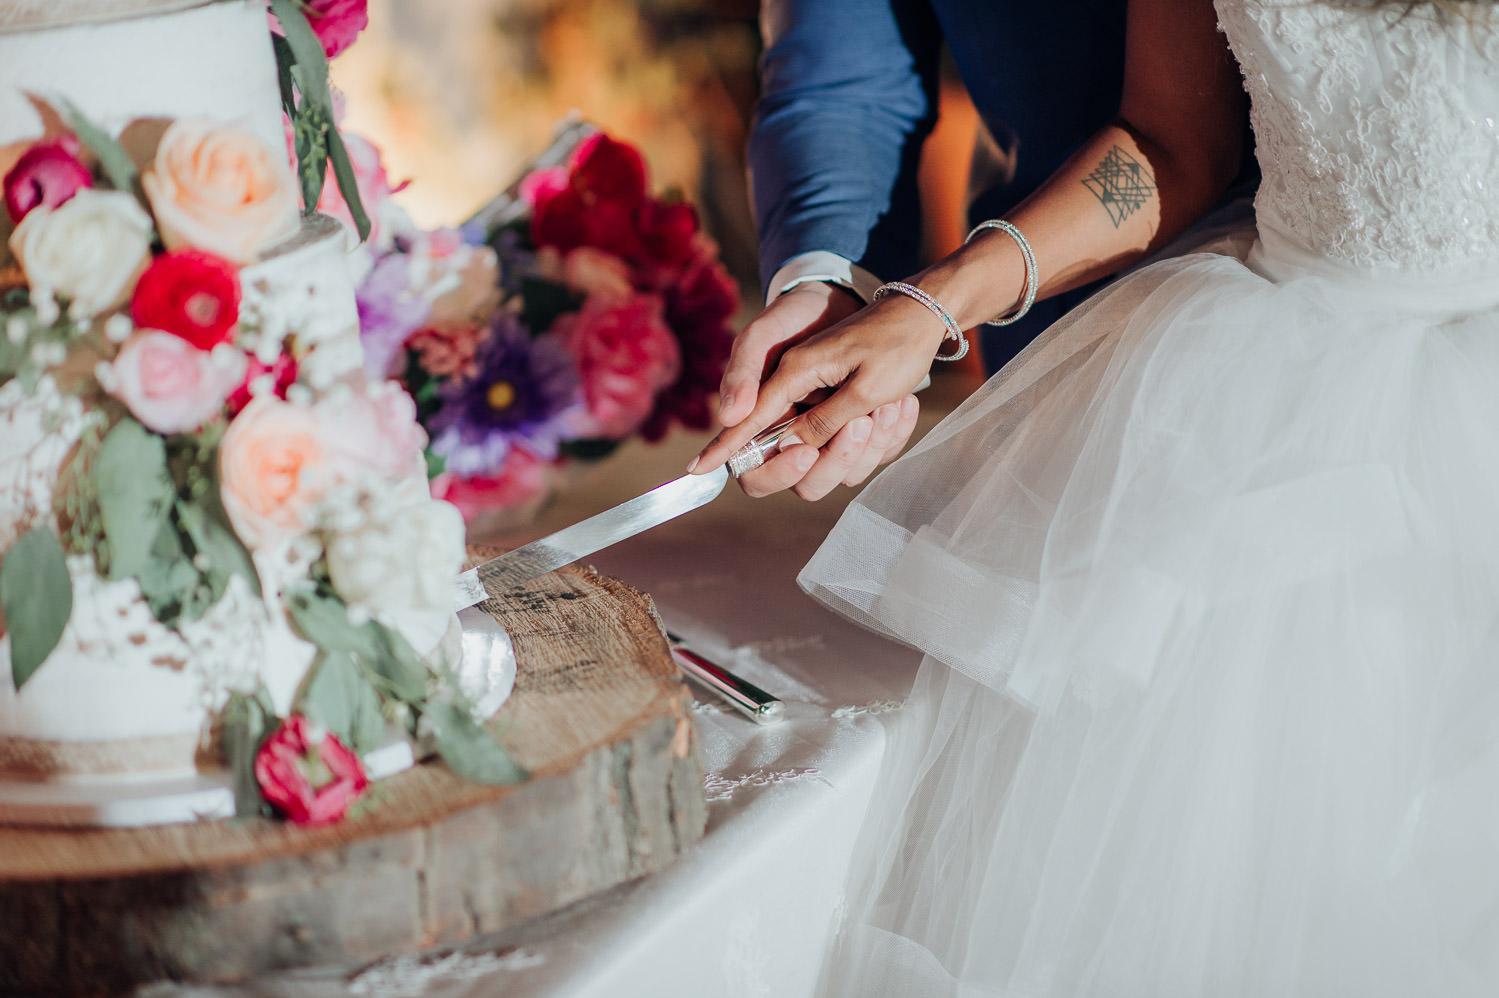 Cake cutting photo at a Toronto wedding featuring Sammycakes